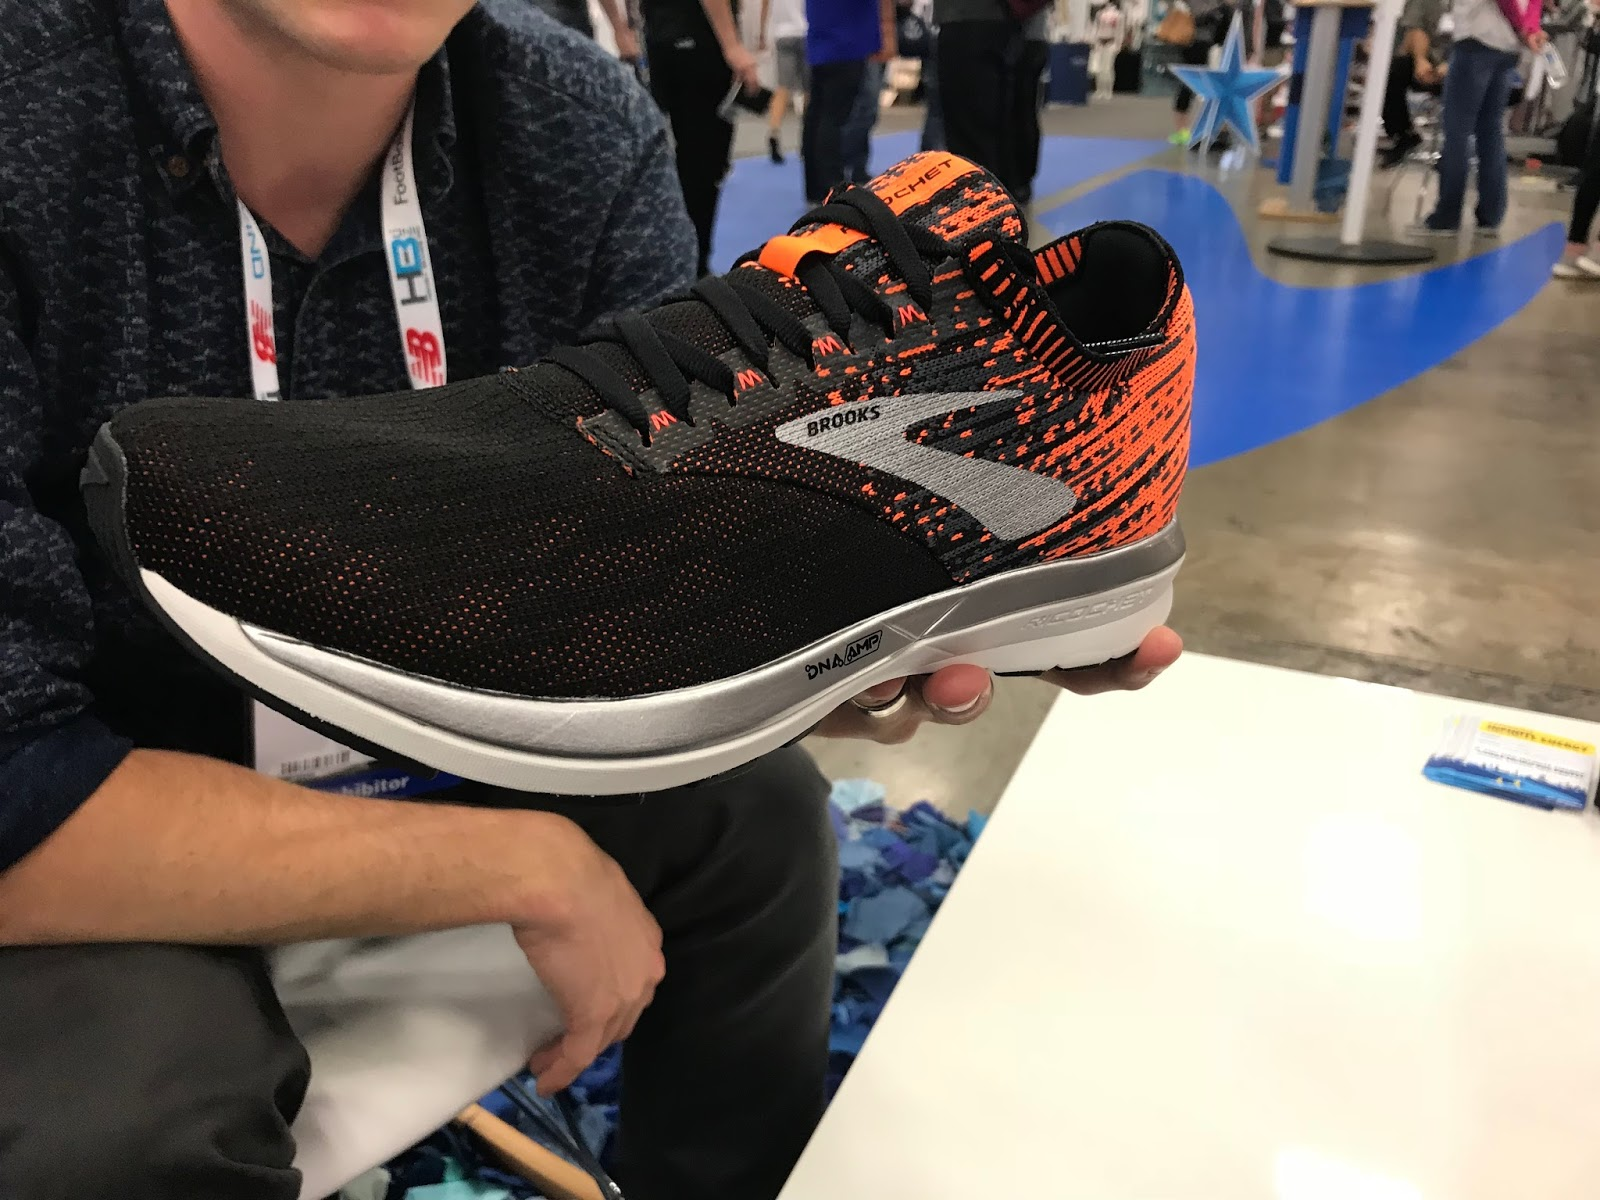 dc6a0b720045a Road Trail Run  Brooks Running Fall 2018 Previews  New Ricochet ...